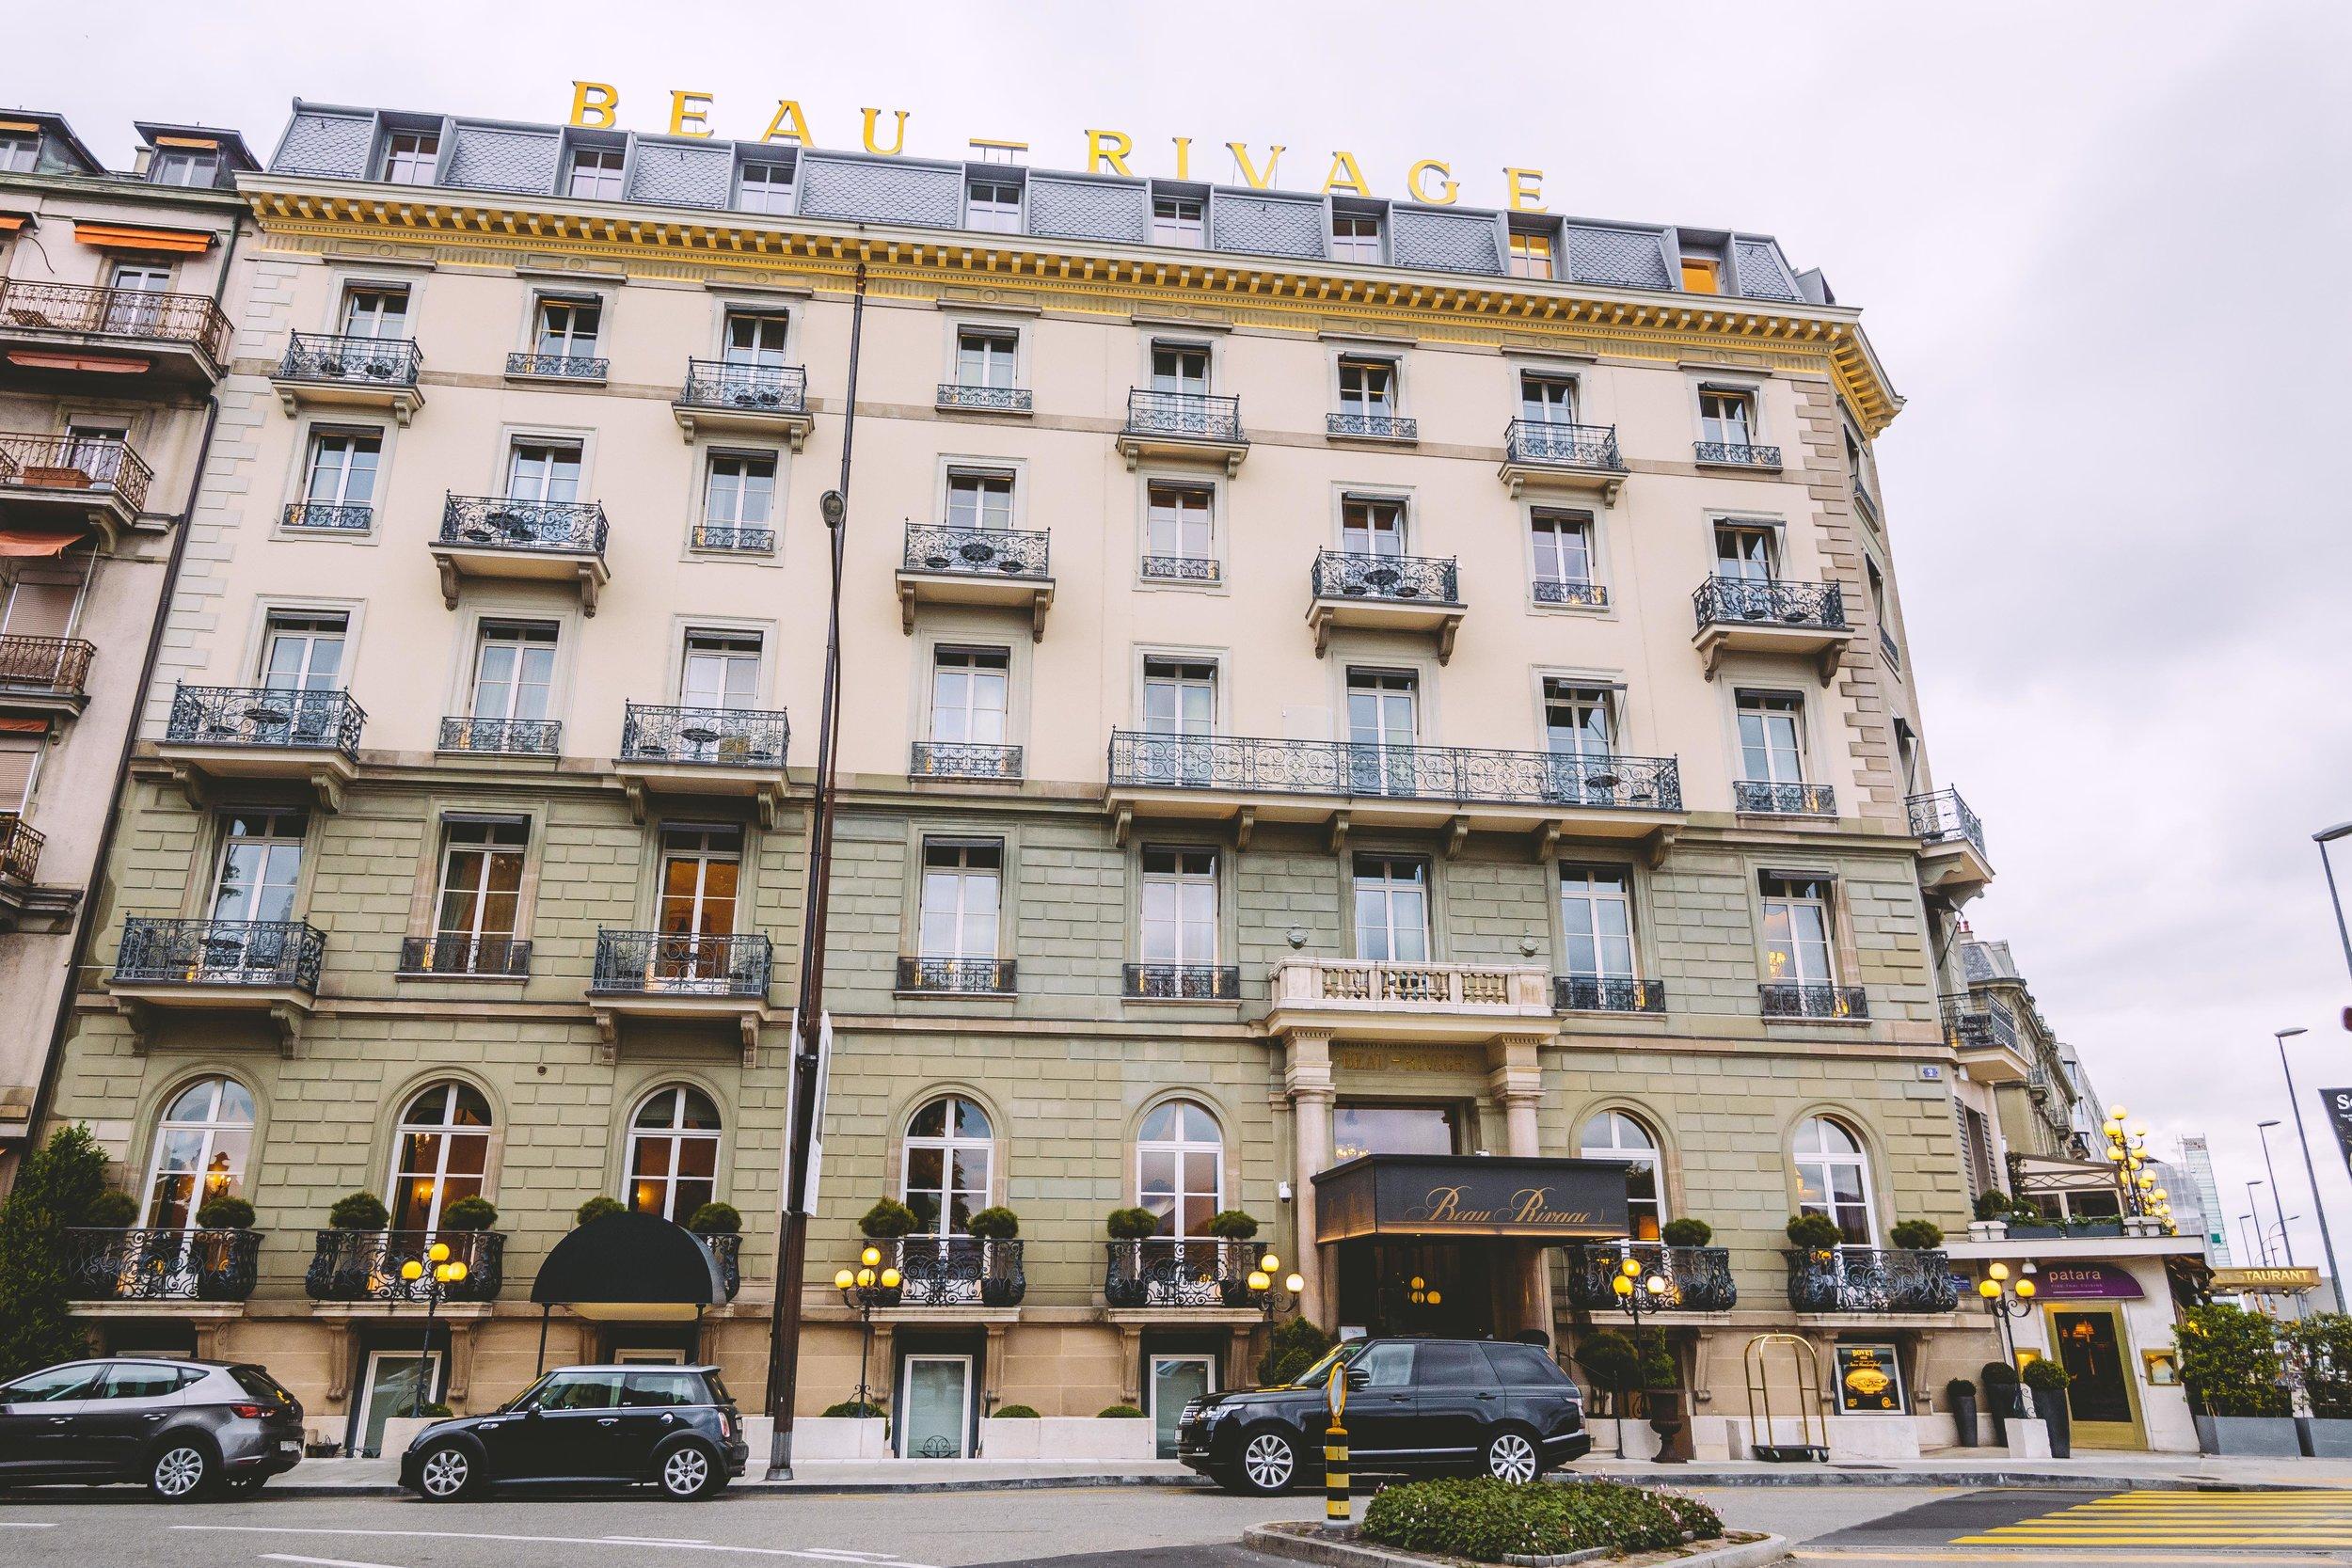 Checking In: Hotel Beau Rivage (Geneva, Switzerland) // #readysetjetset #geneva #switzerland #europe #hotels #luxuryhotels www.readysetjetset.net